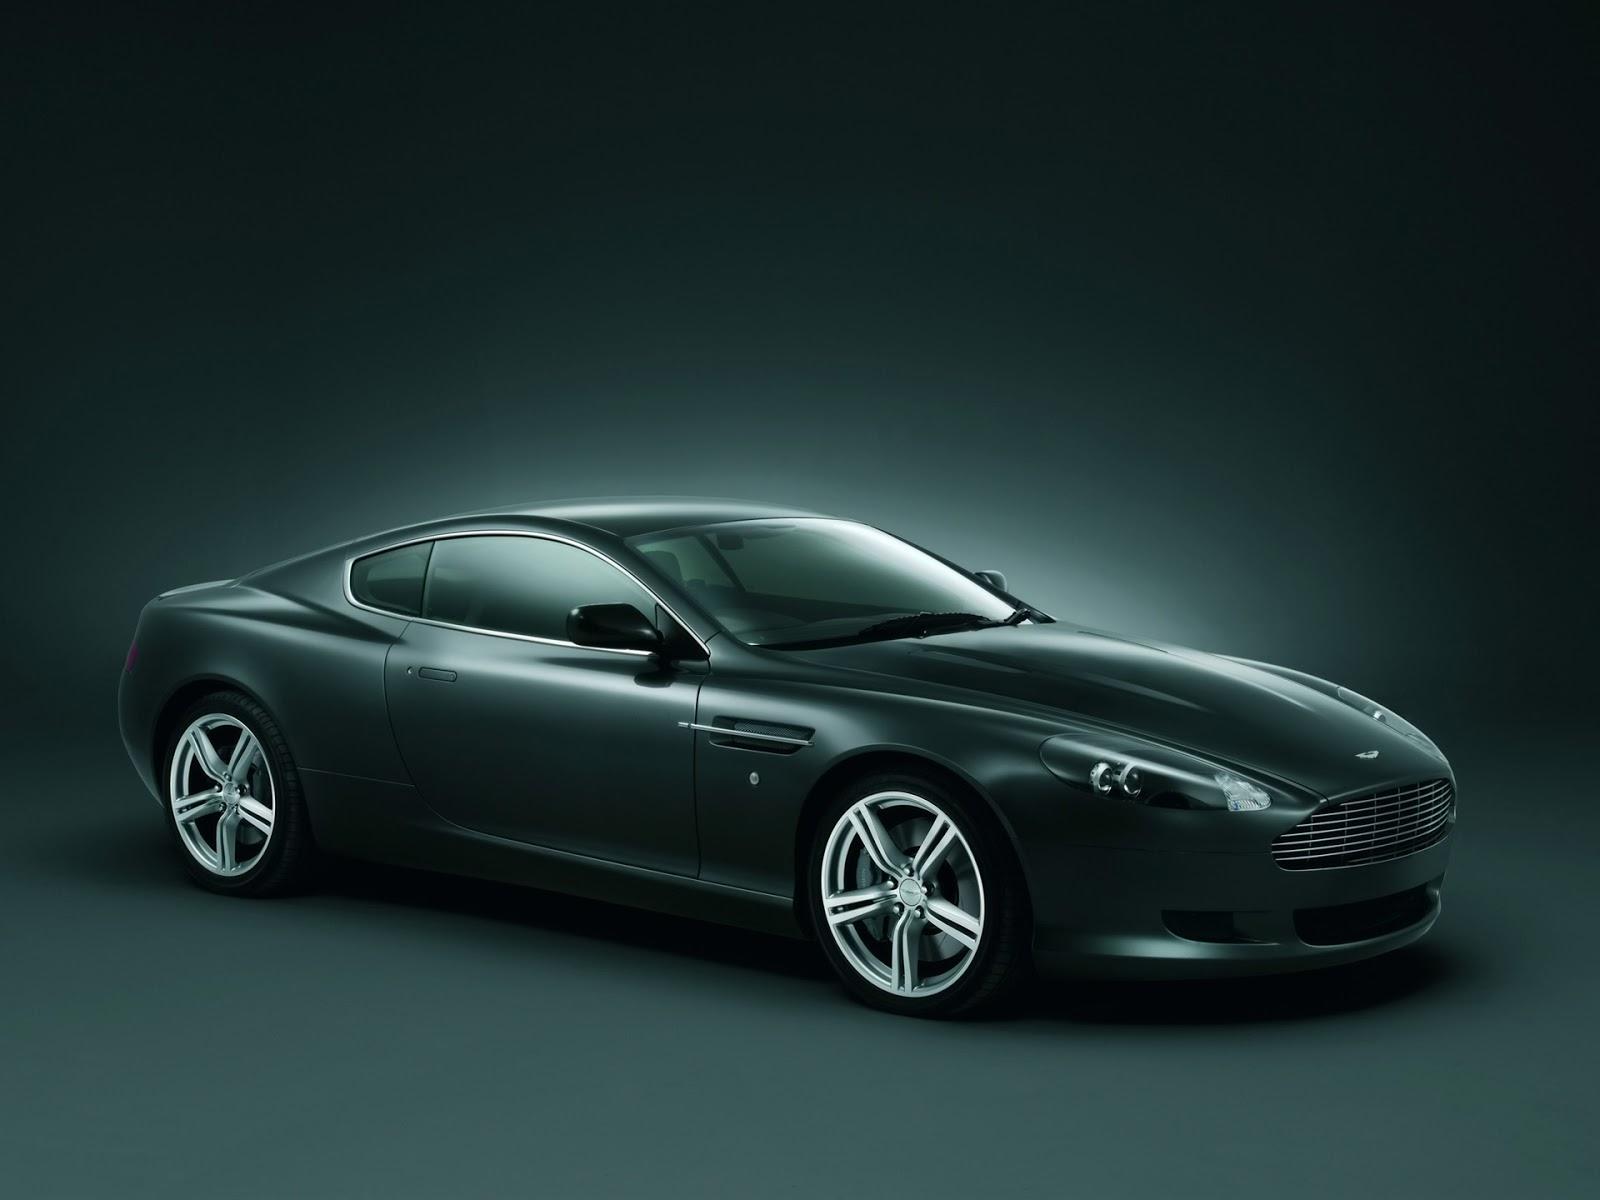 Aston Martin DB9 Desktop Backgrounds Free